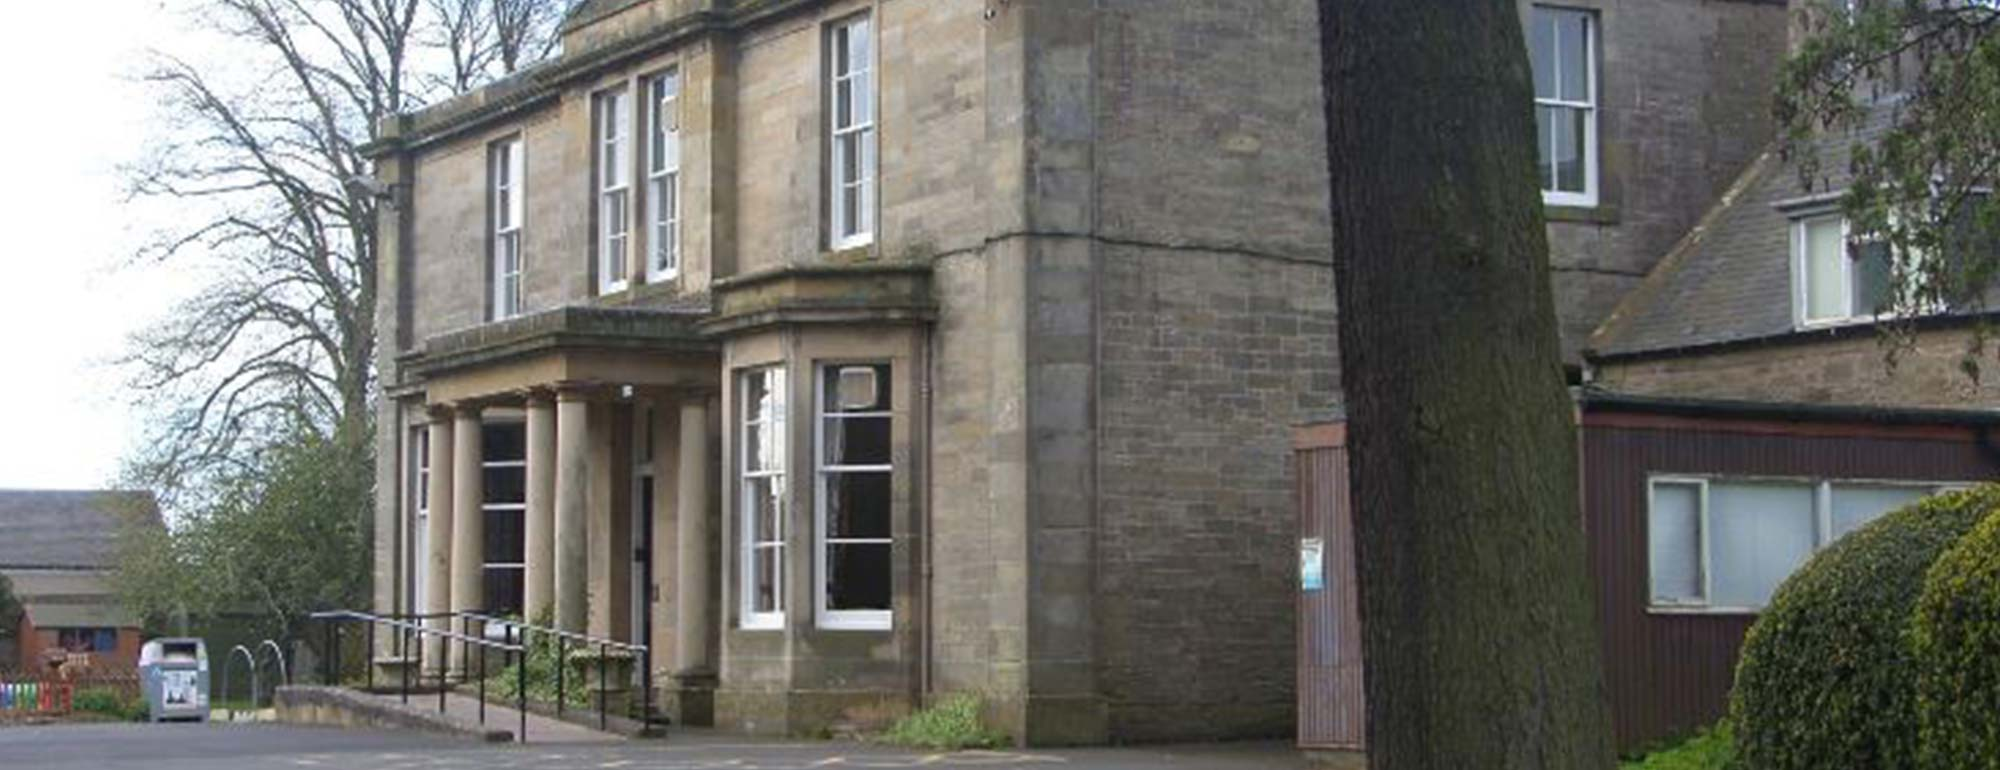 book-community-centres-duns-southfield